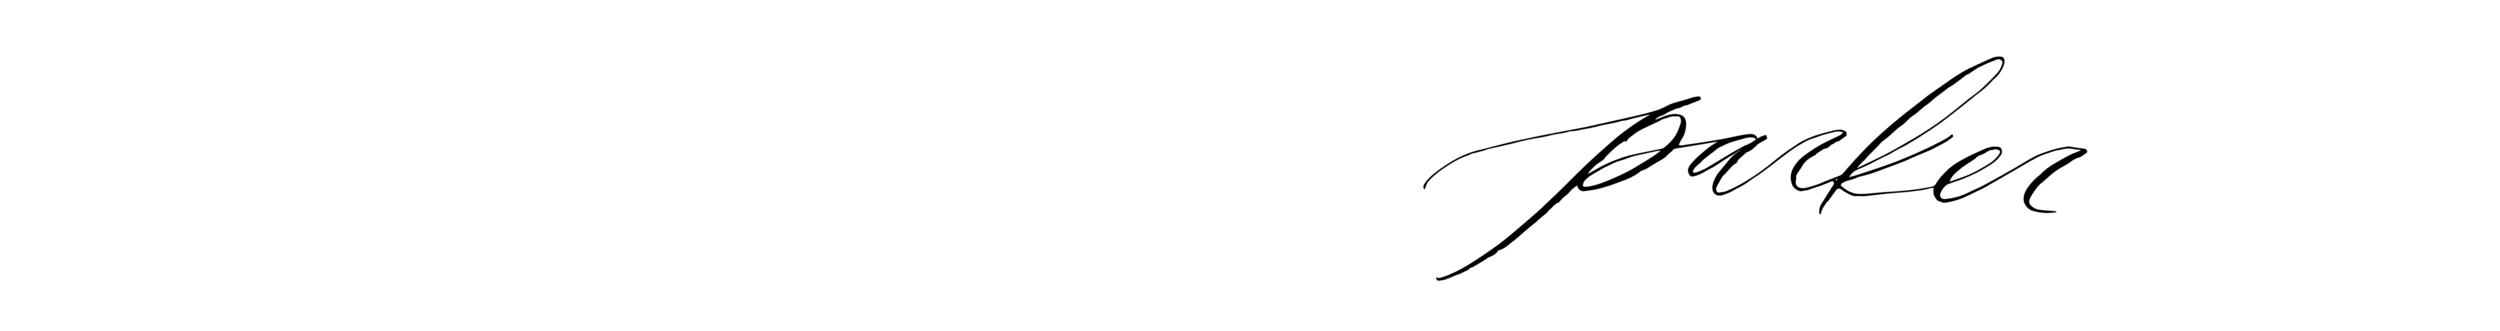 First-Name-Transparent-Background blog signature.png